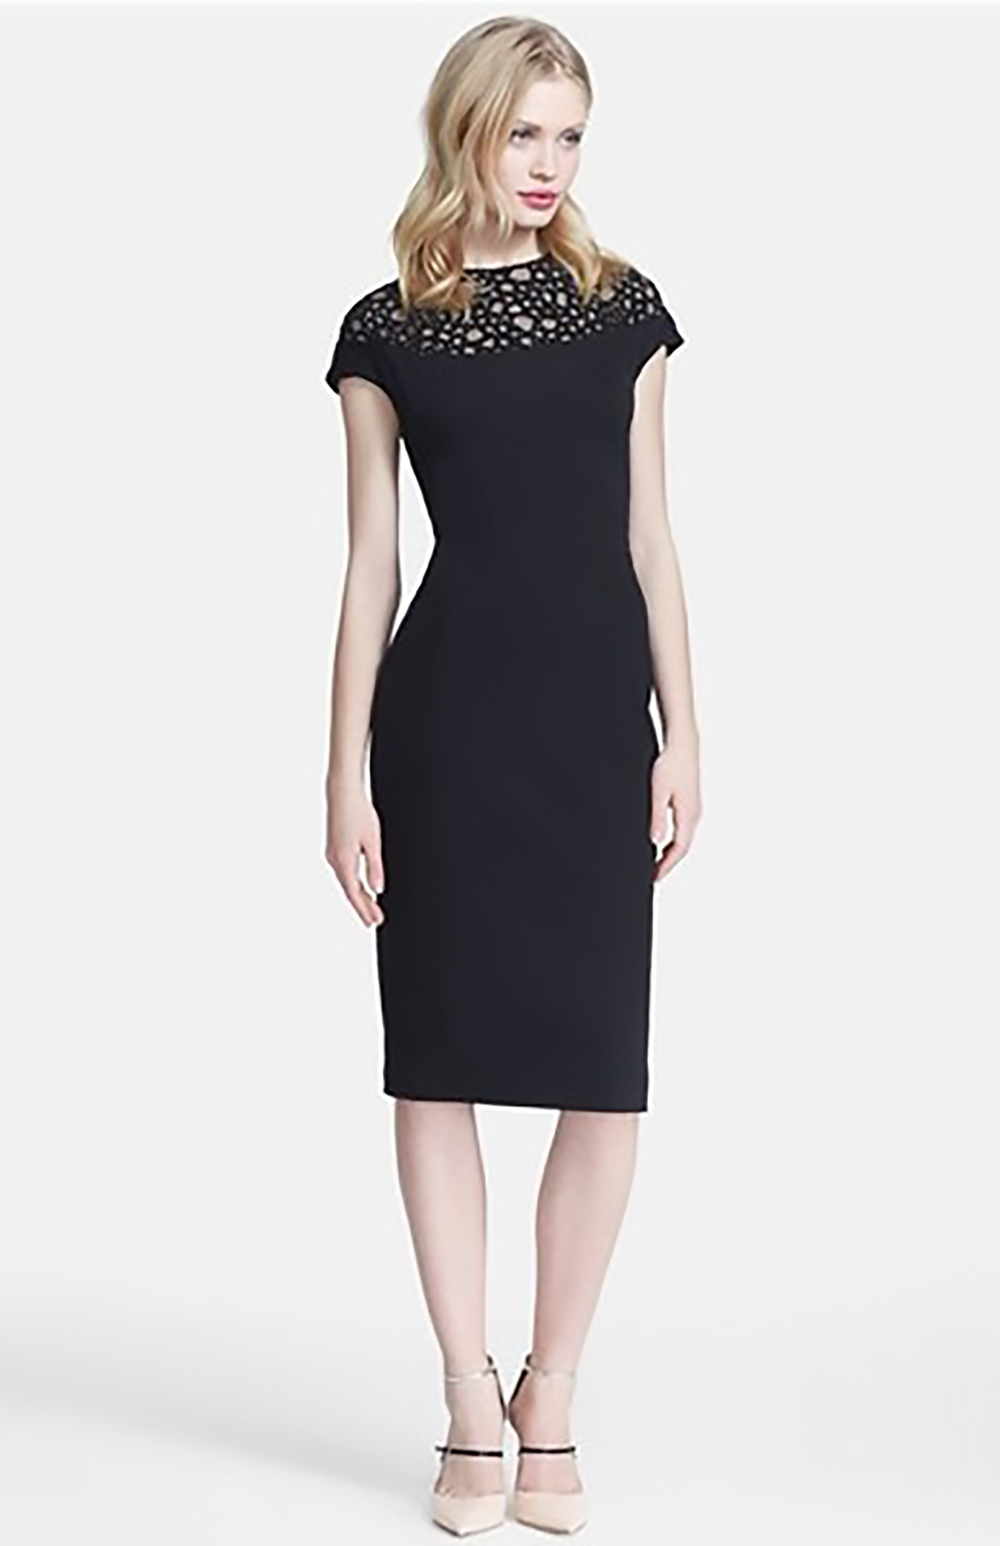 nordstrom lela rose embellished yoke sheath dress 1500.jpg